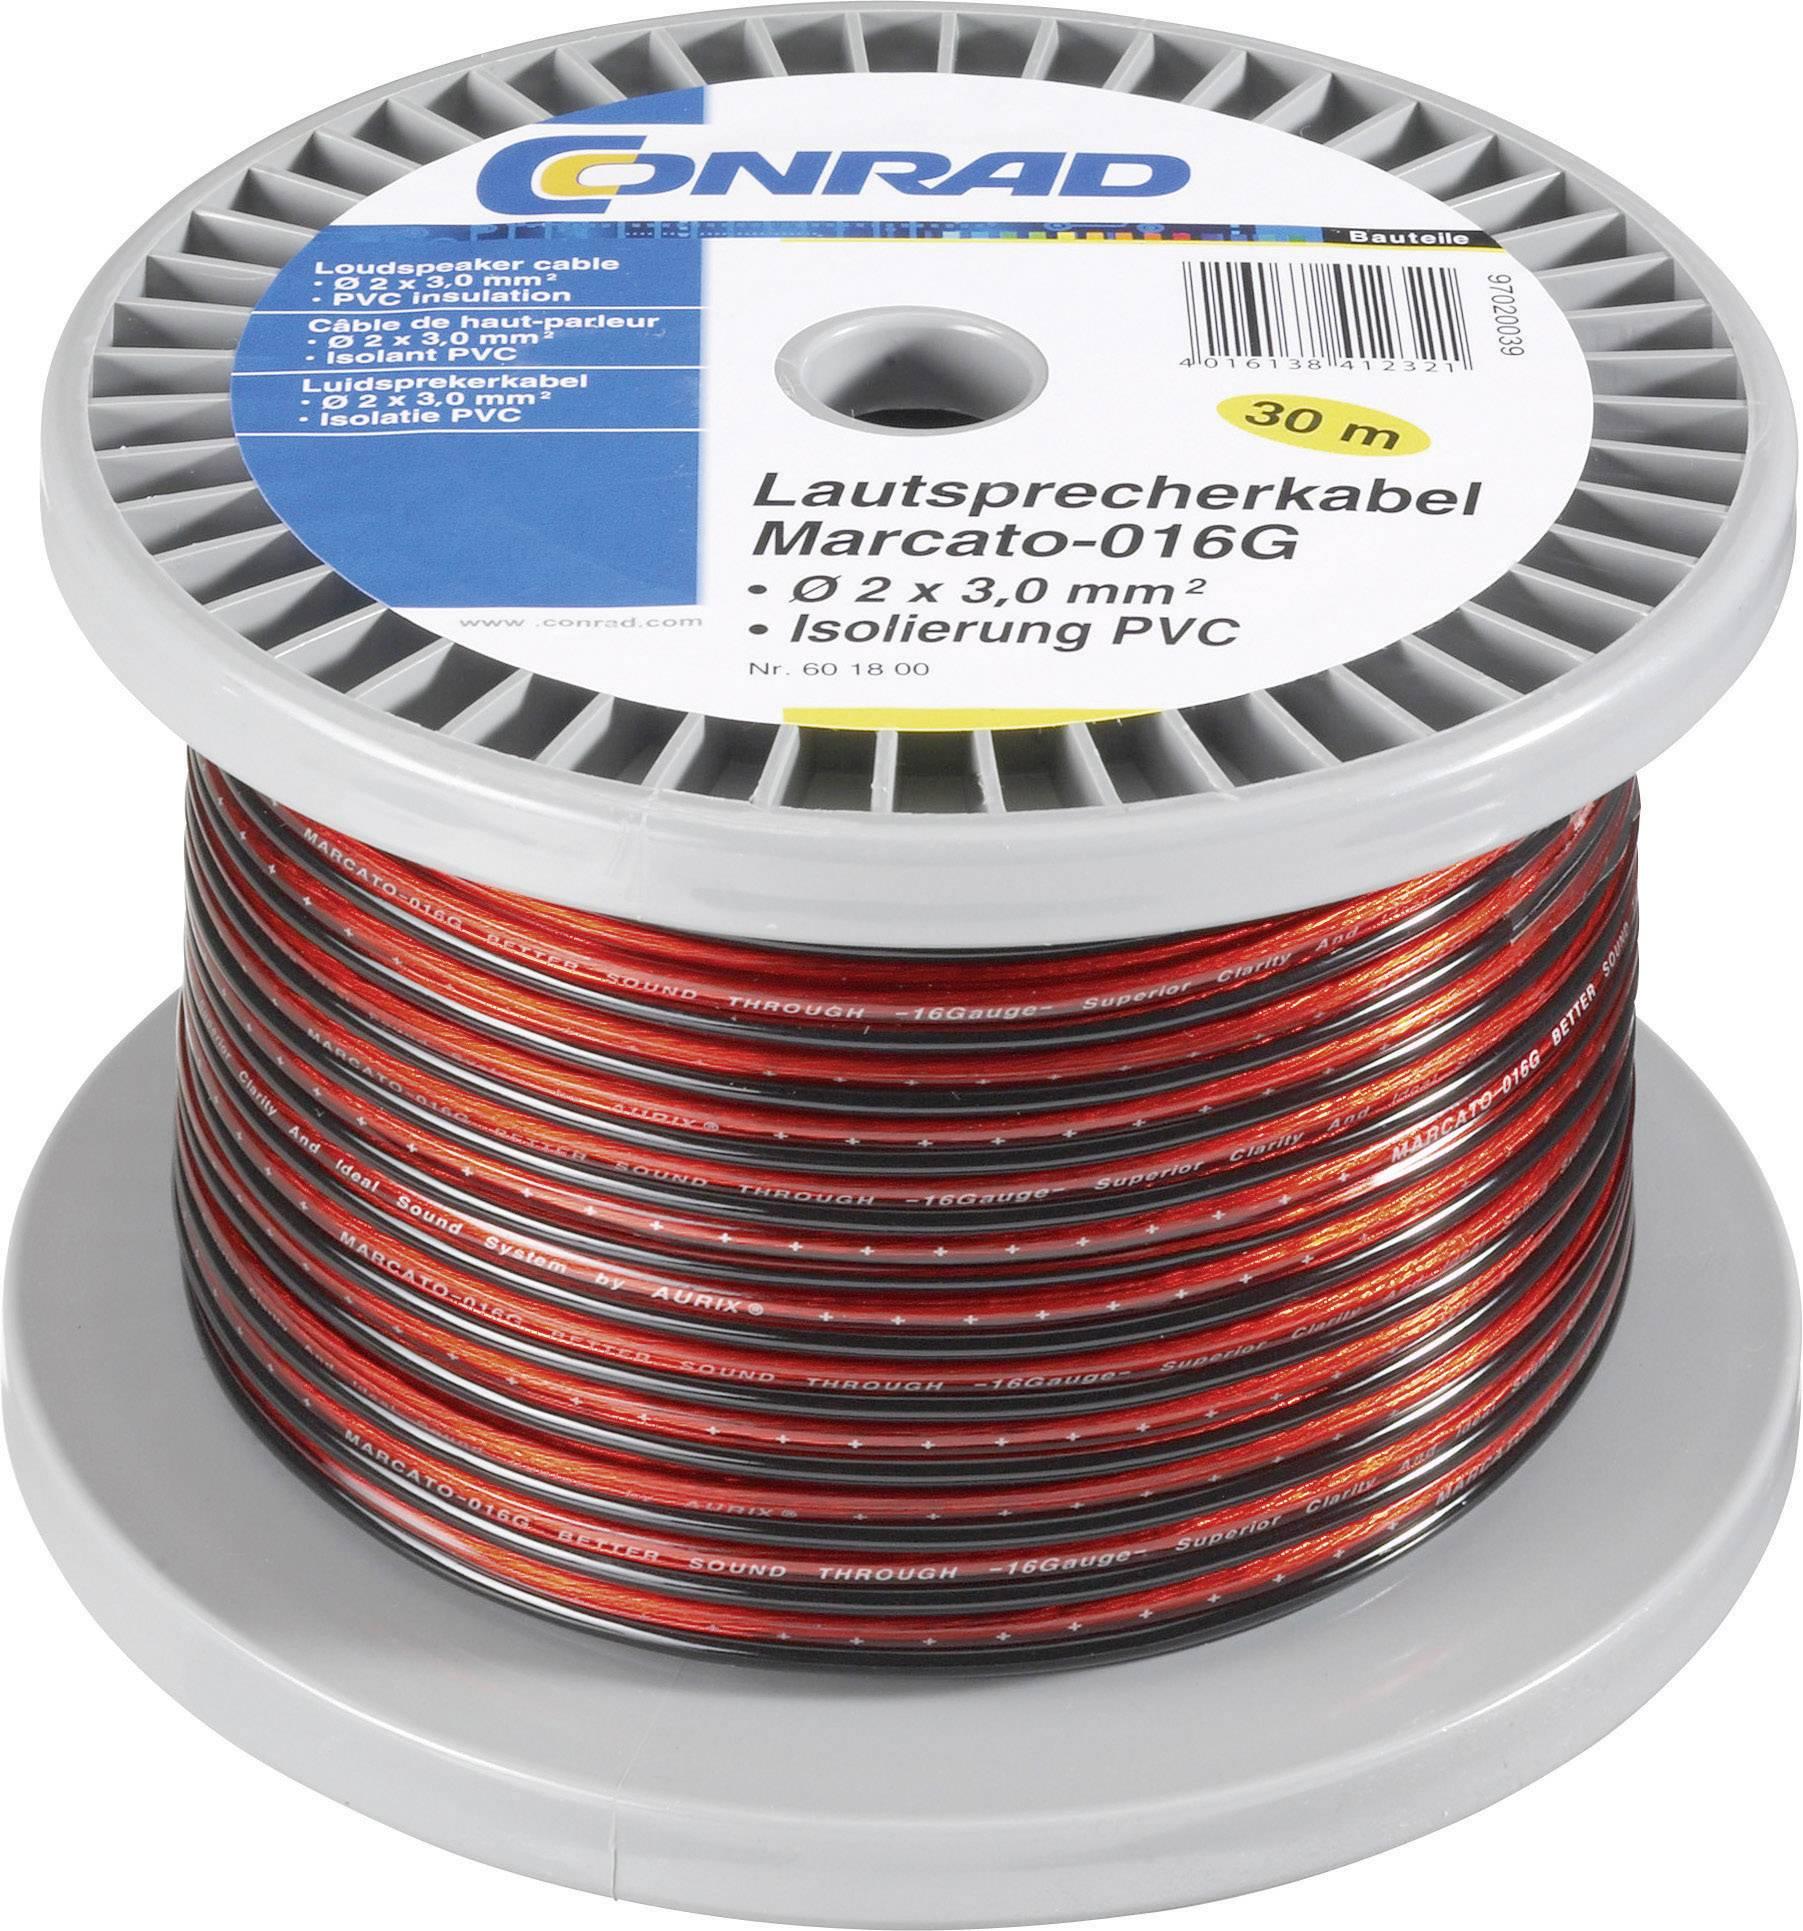 Reproduktorový kabel, 93003C17, 100 m, červená/černá